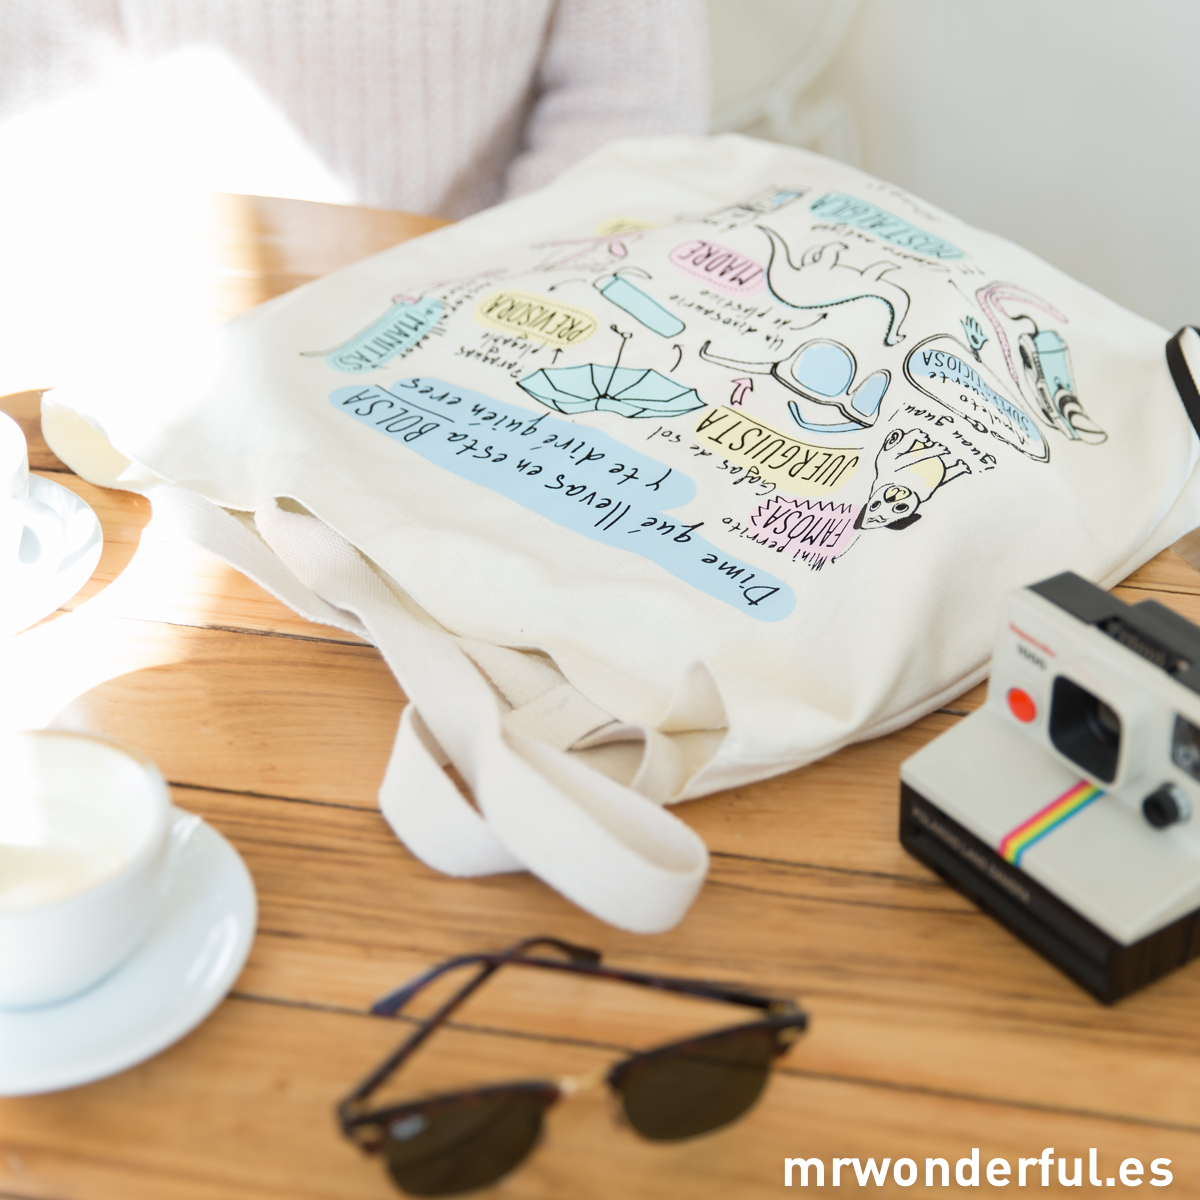 mrwonderful_tela07-bolsa-tela-dime-qu_-llevas-en-esta-bolsa-31